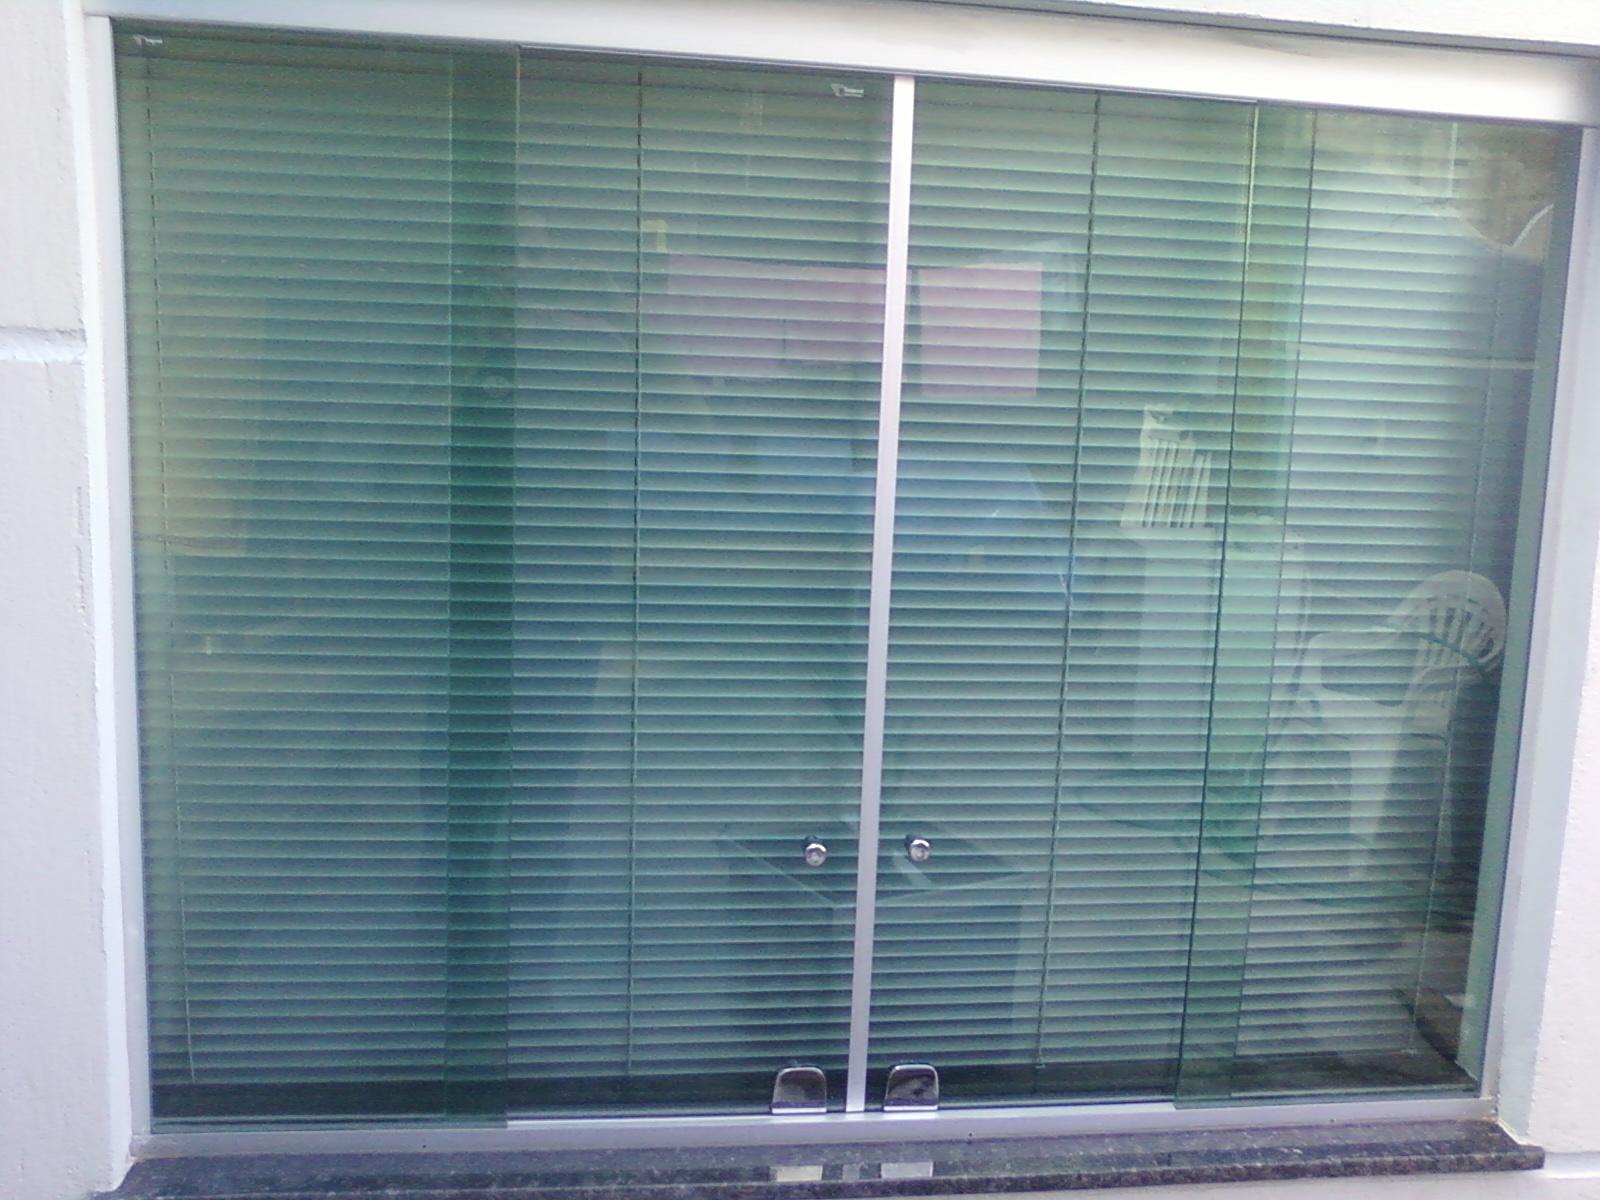 #3C4D61 janela blindex kit aluminio natural fosco vidro verde com ferragens  504 Janelas E Portas De Vidro Verde